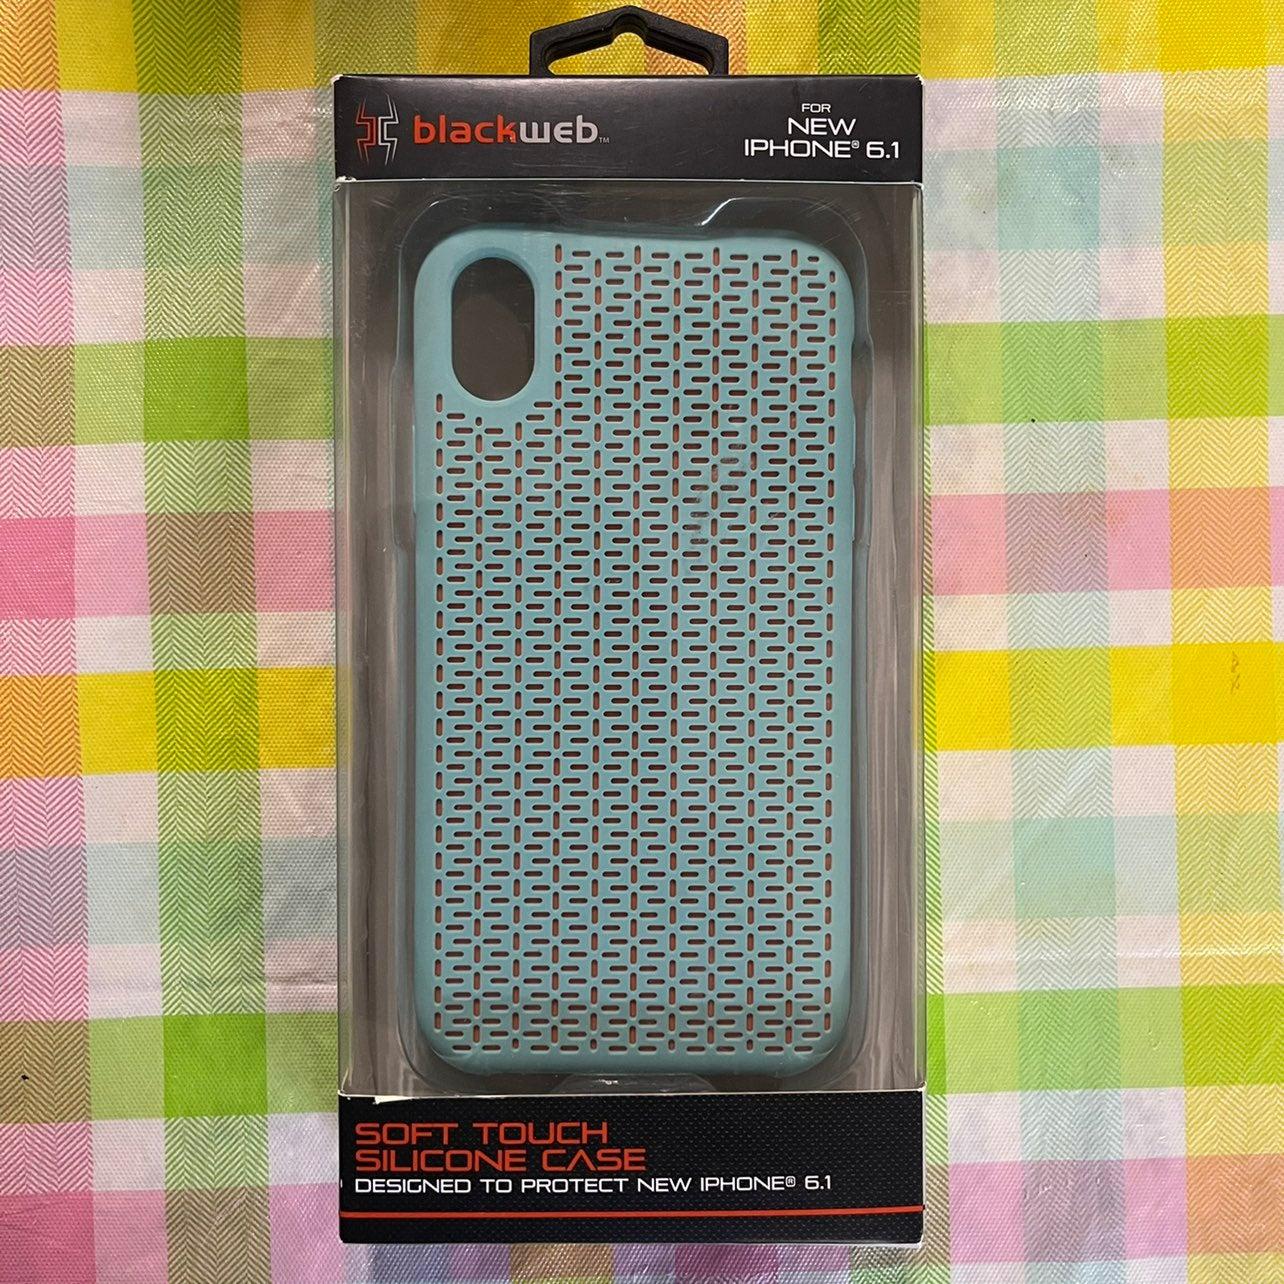 Blackweb Soft Touch Silicone Case